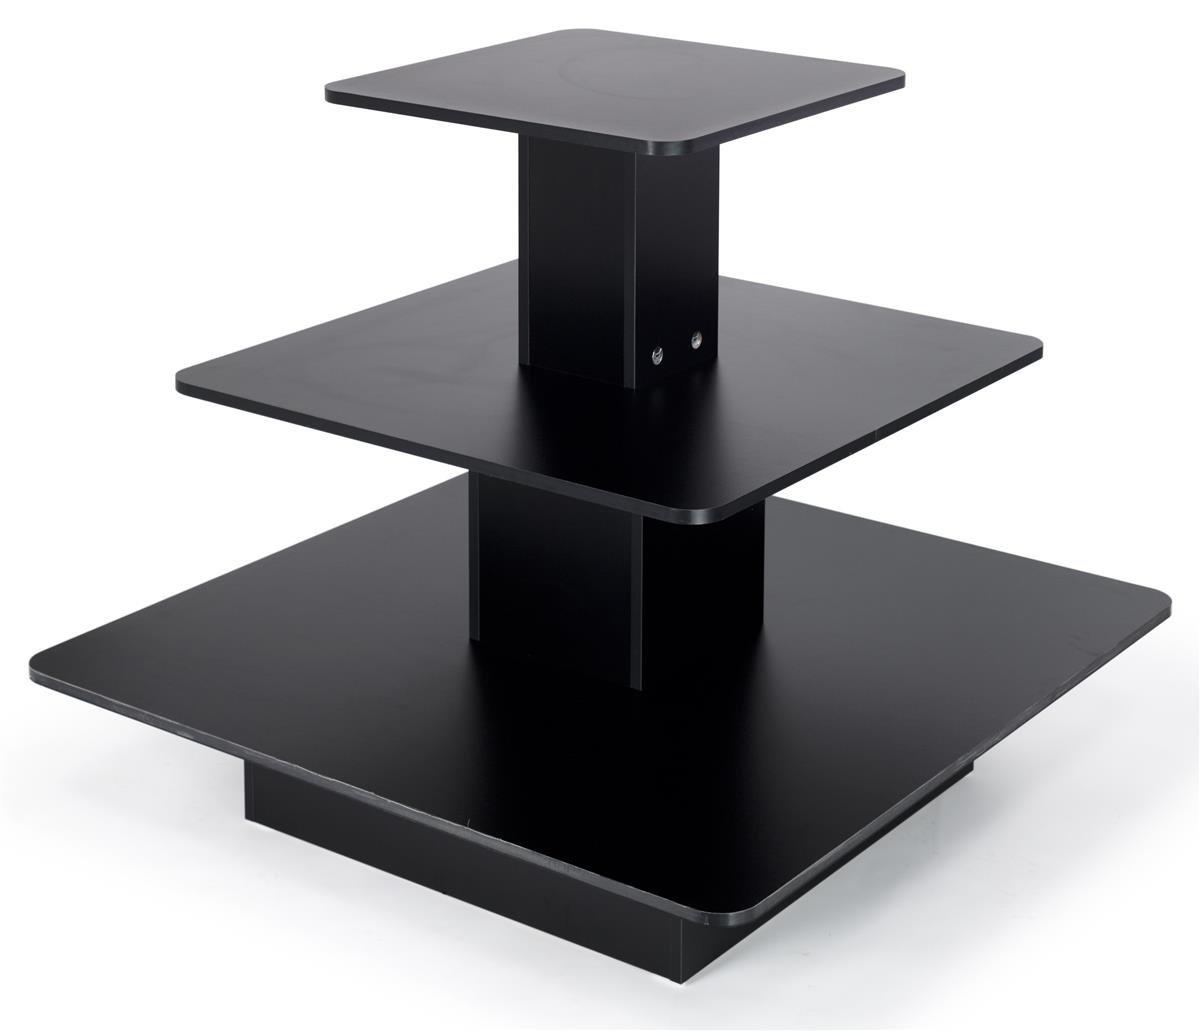 Displays2go 48 x 48 Inch Three-Tiered Display Table, Square - Black (3TST4848BK)